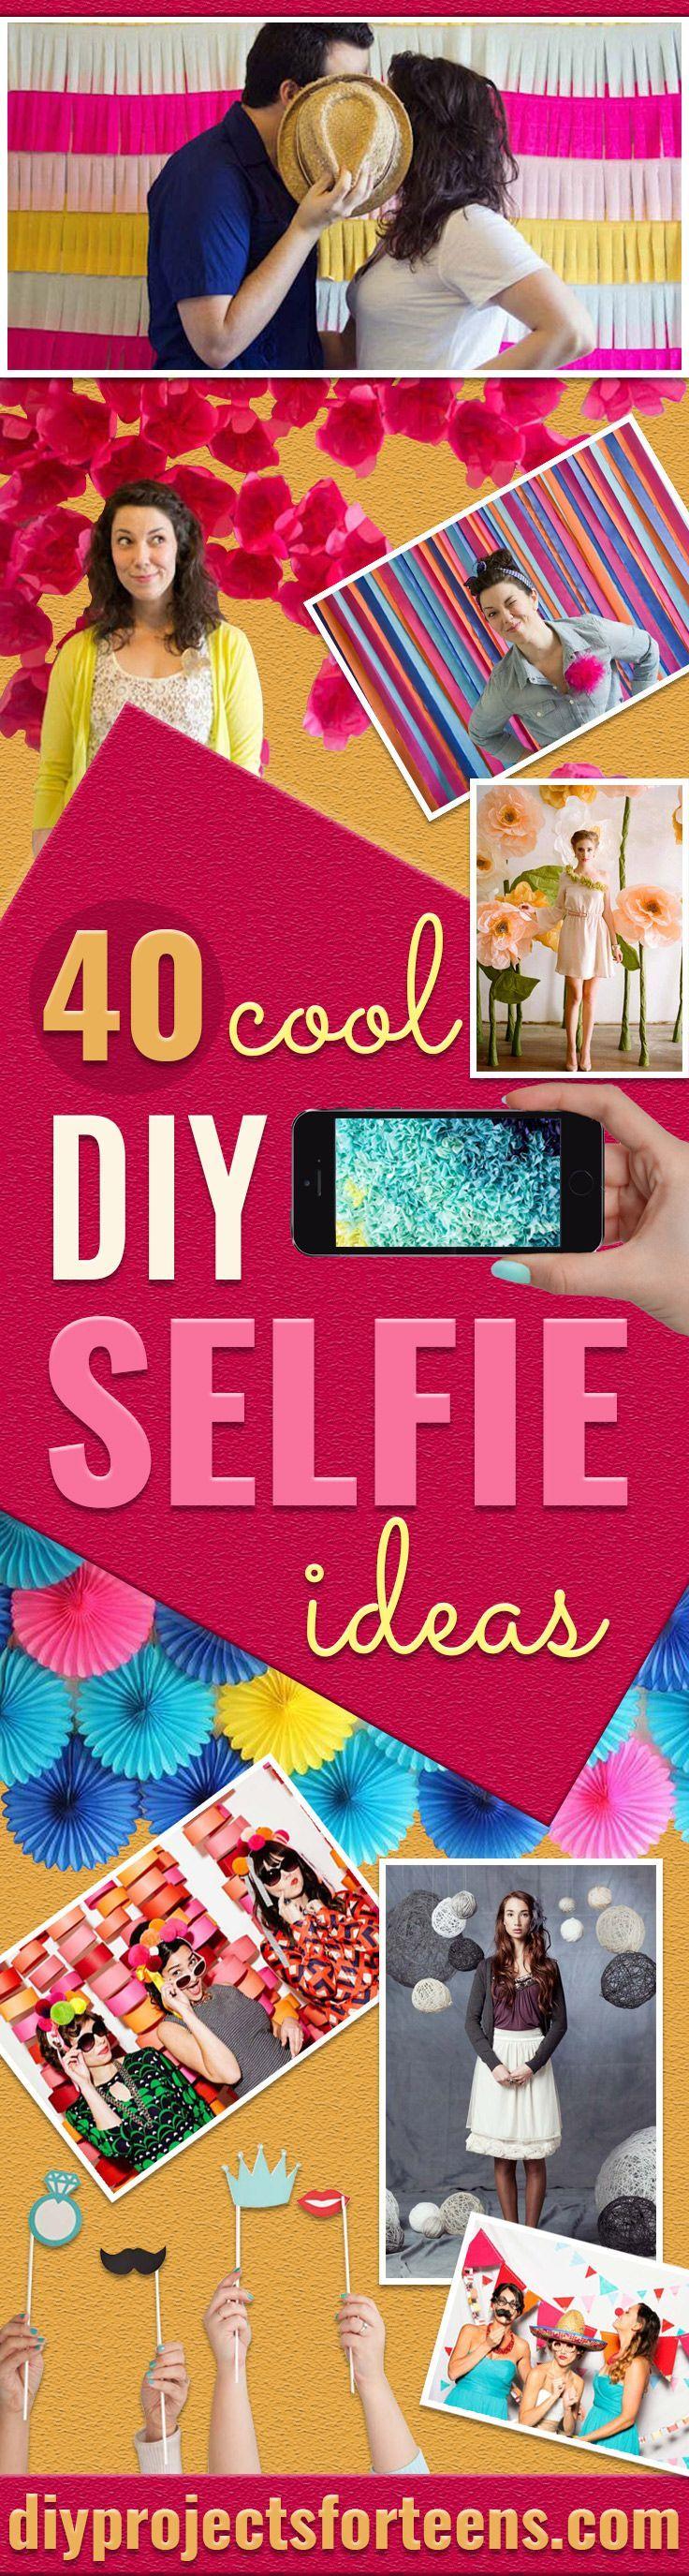 best 25 creative selfie ideas ideas on pinterest